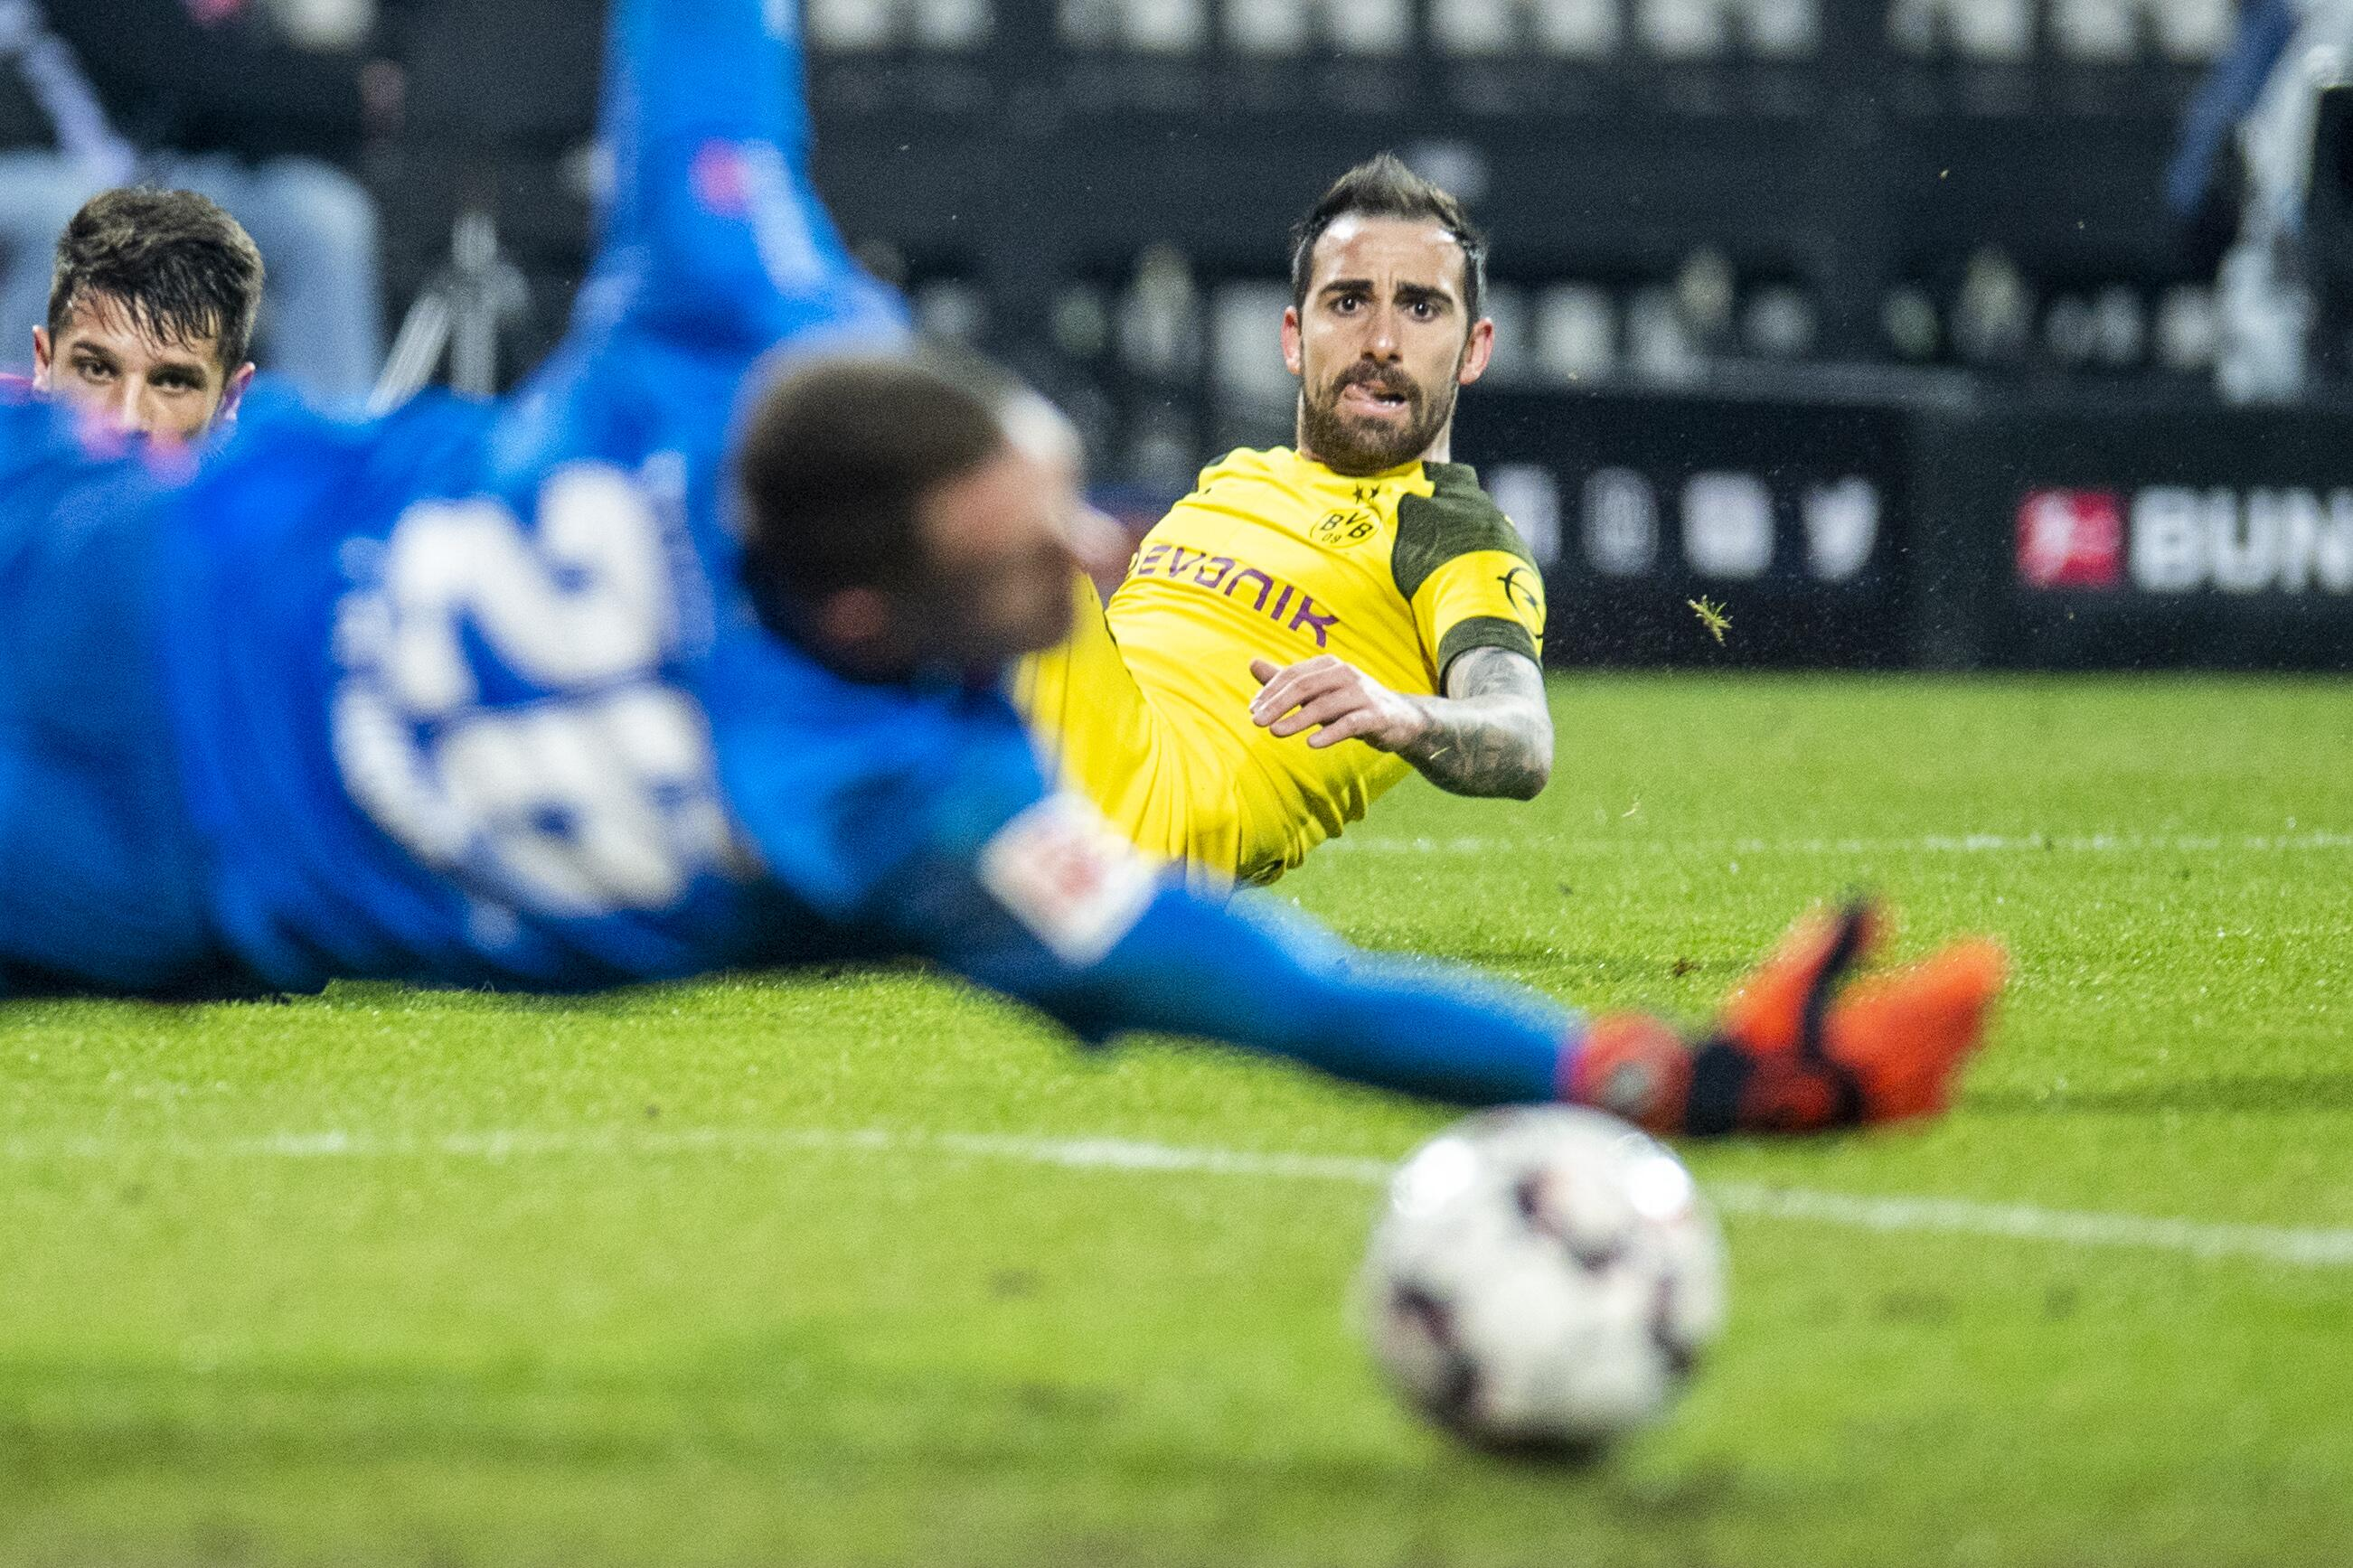 Bild zu Paco Alcacer, Christian Mathenia, 1. FC Nürnberg, Borussia Dortmund, Bundesliga